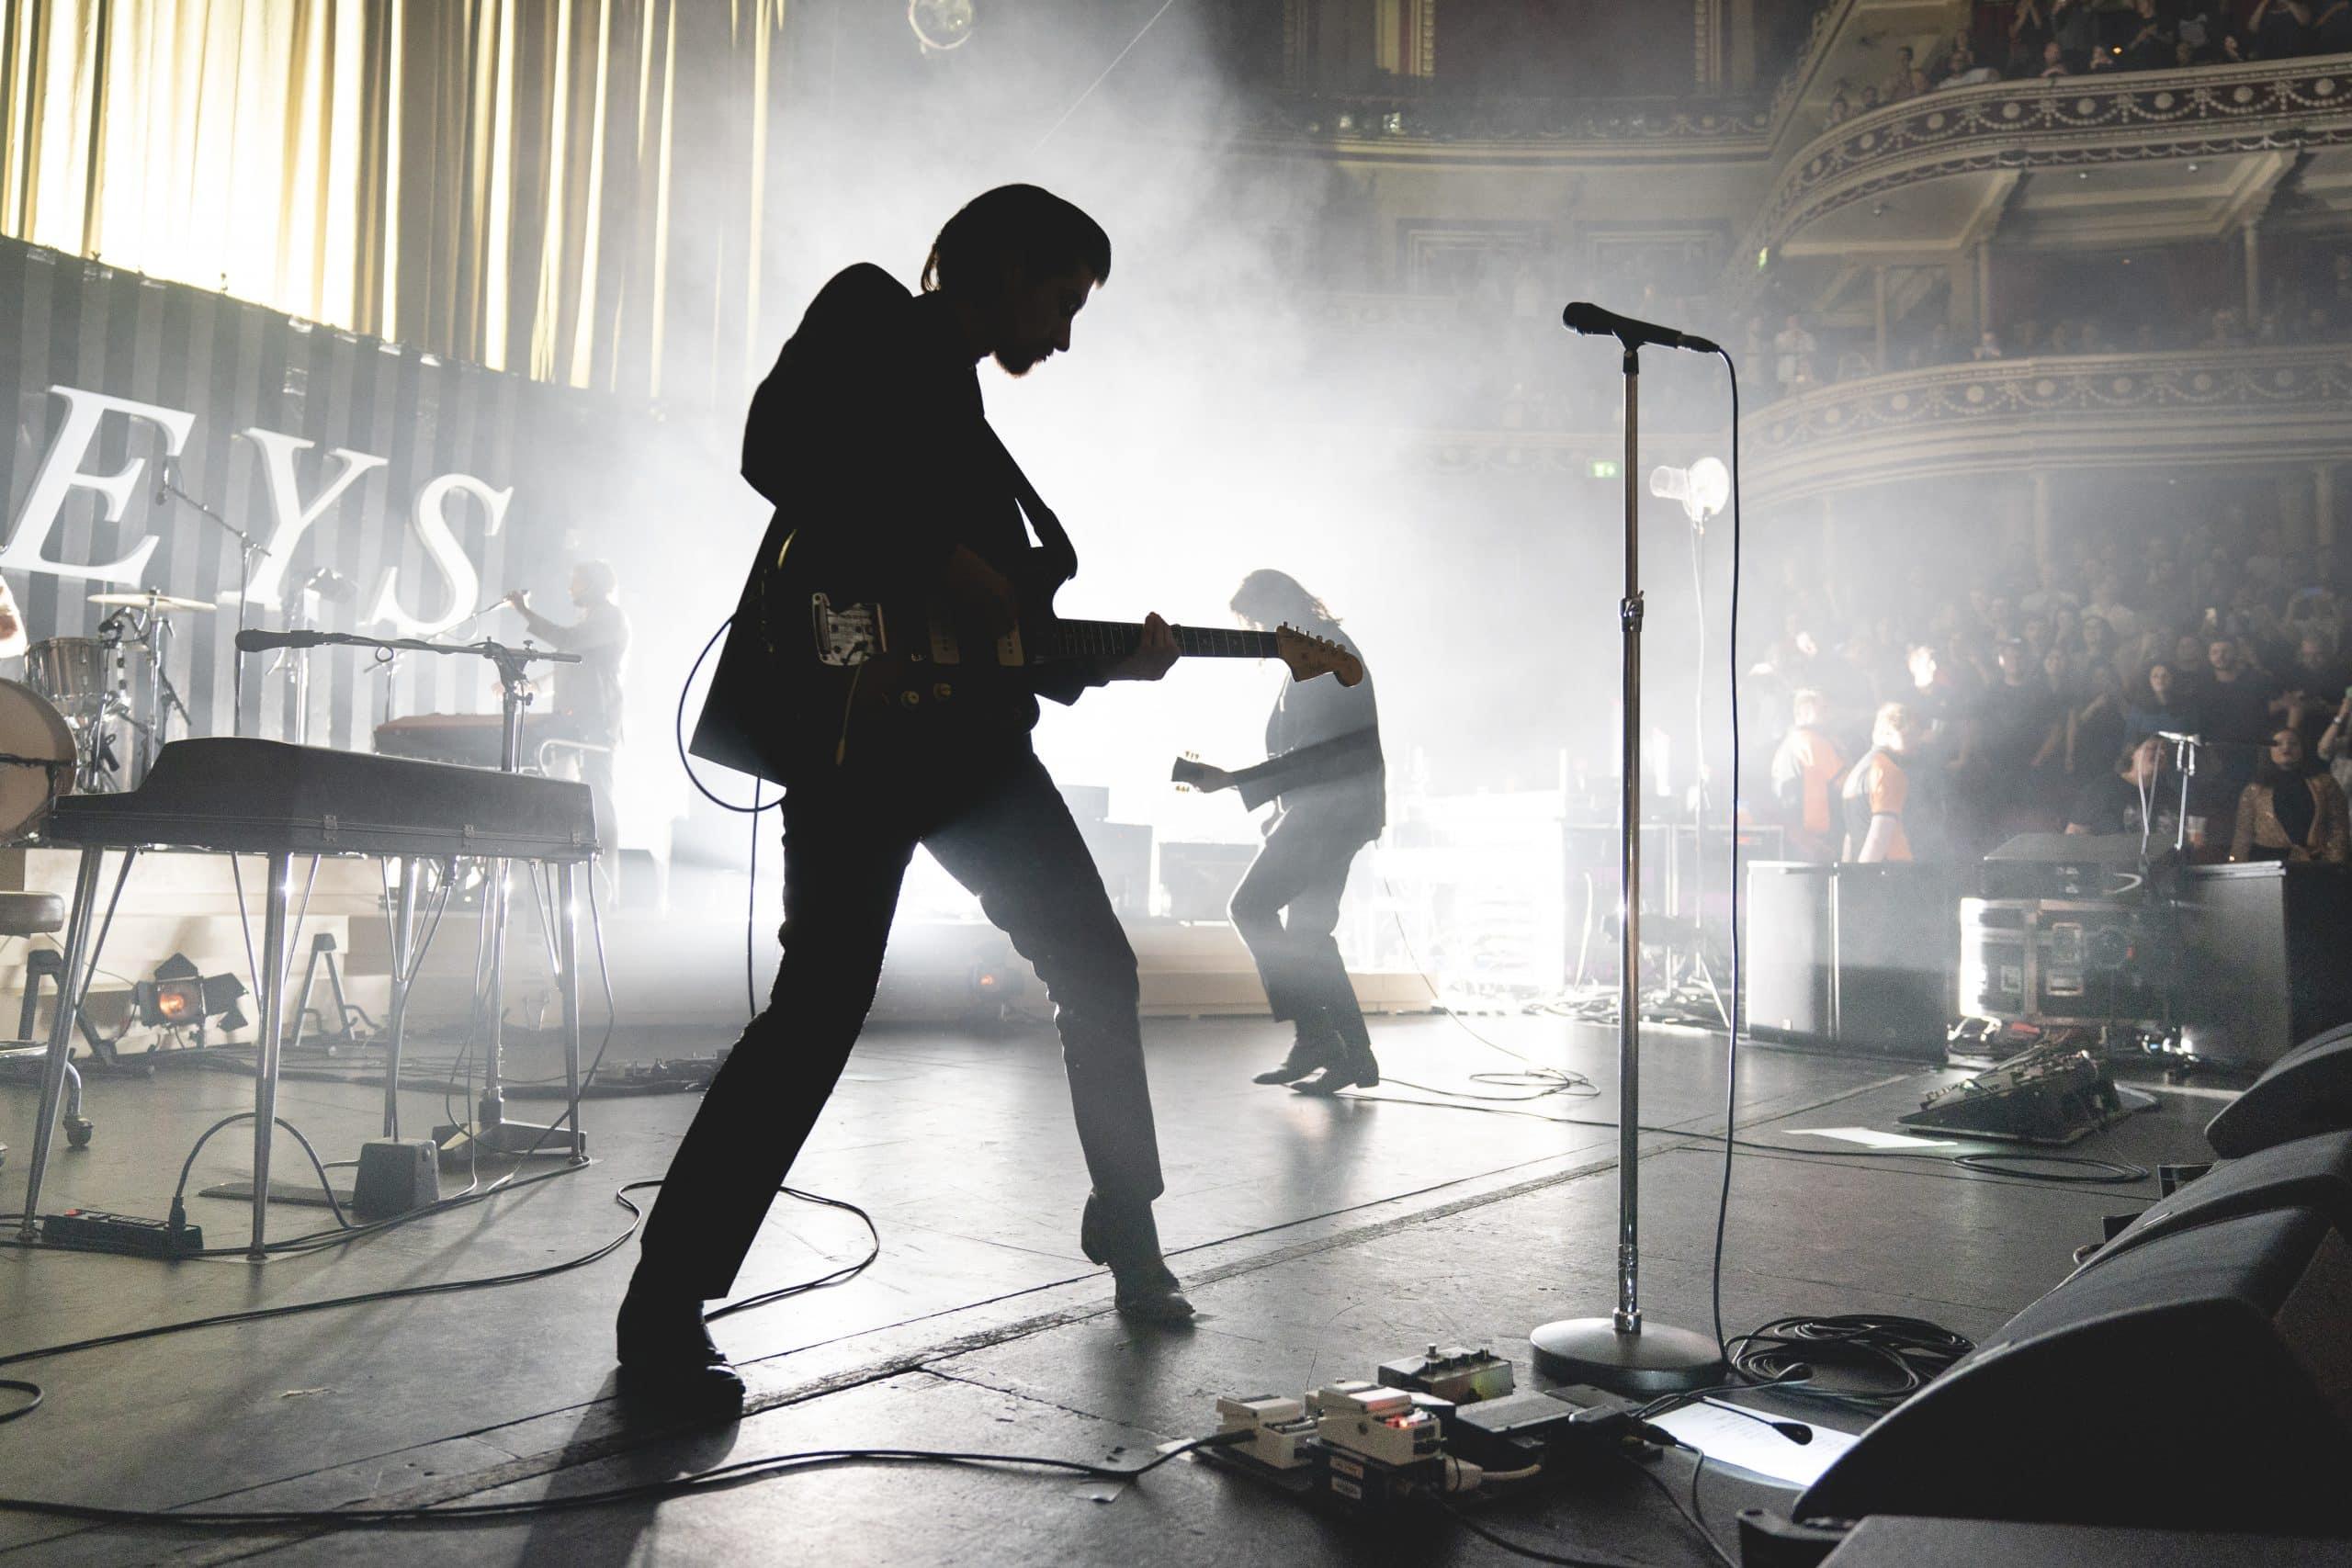 Arctic Monkeys live at the royal albert hall